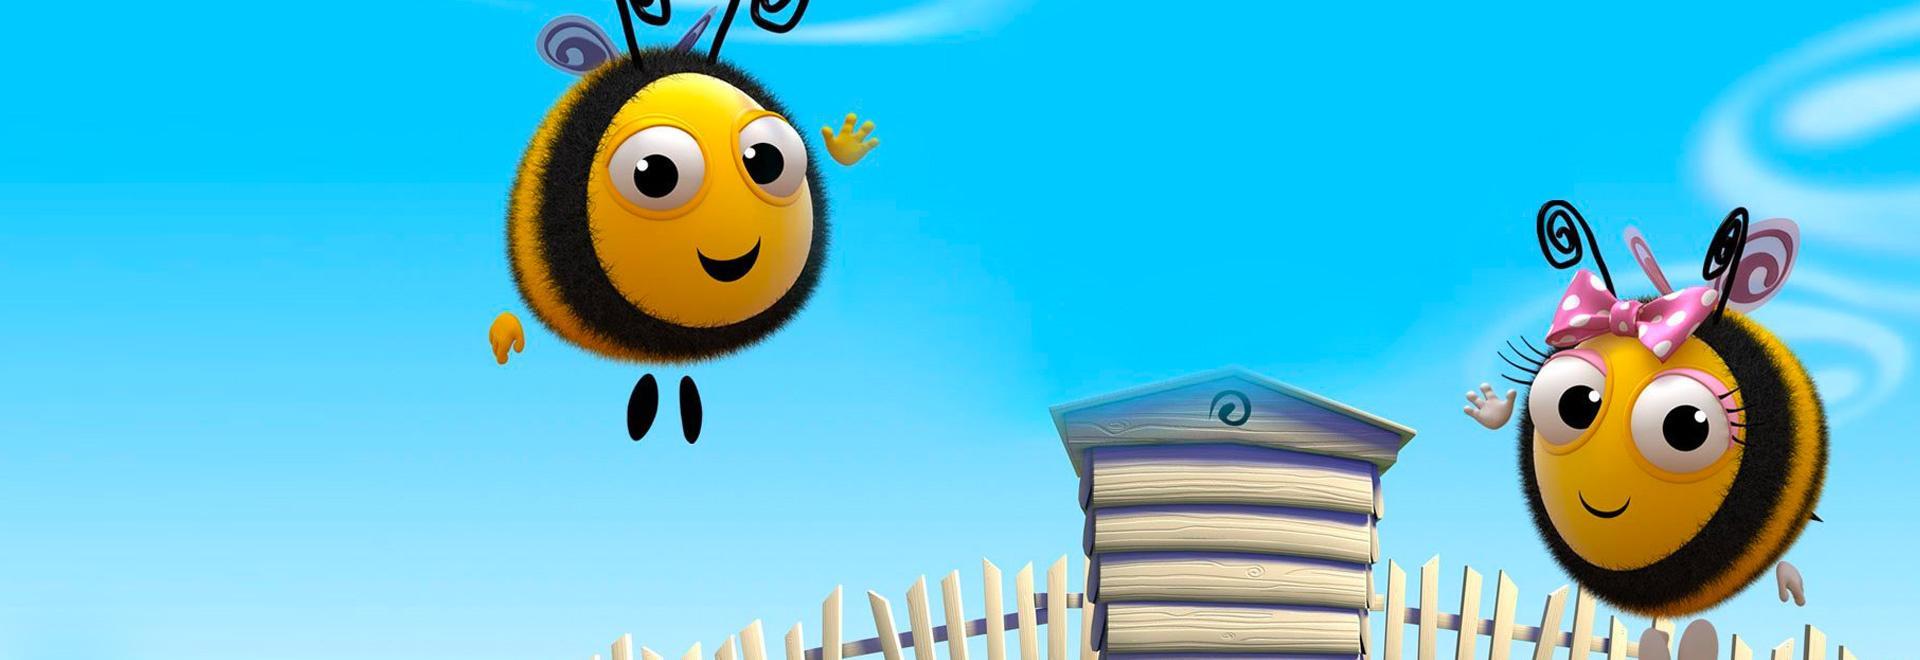 Buzzbee vanitoso